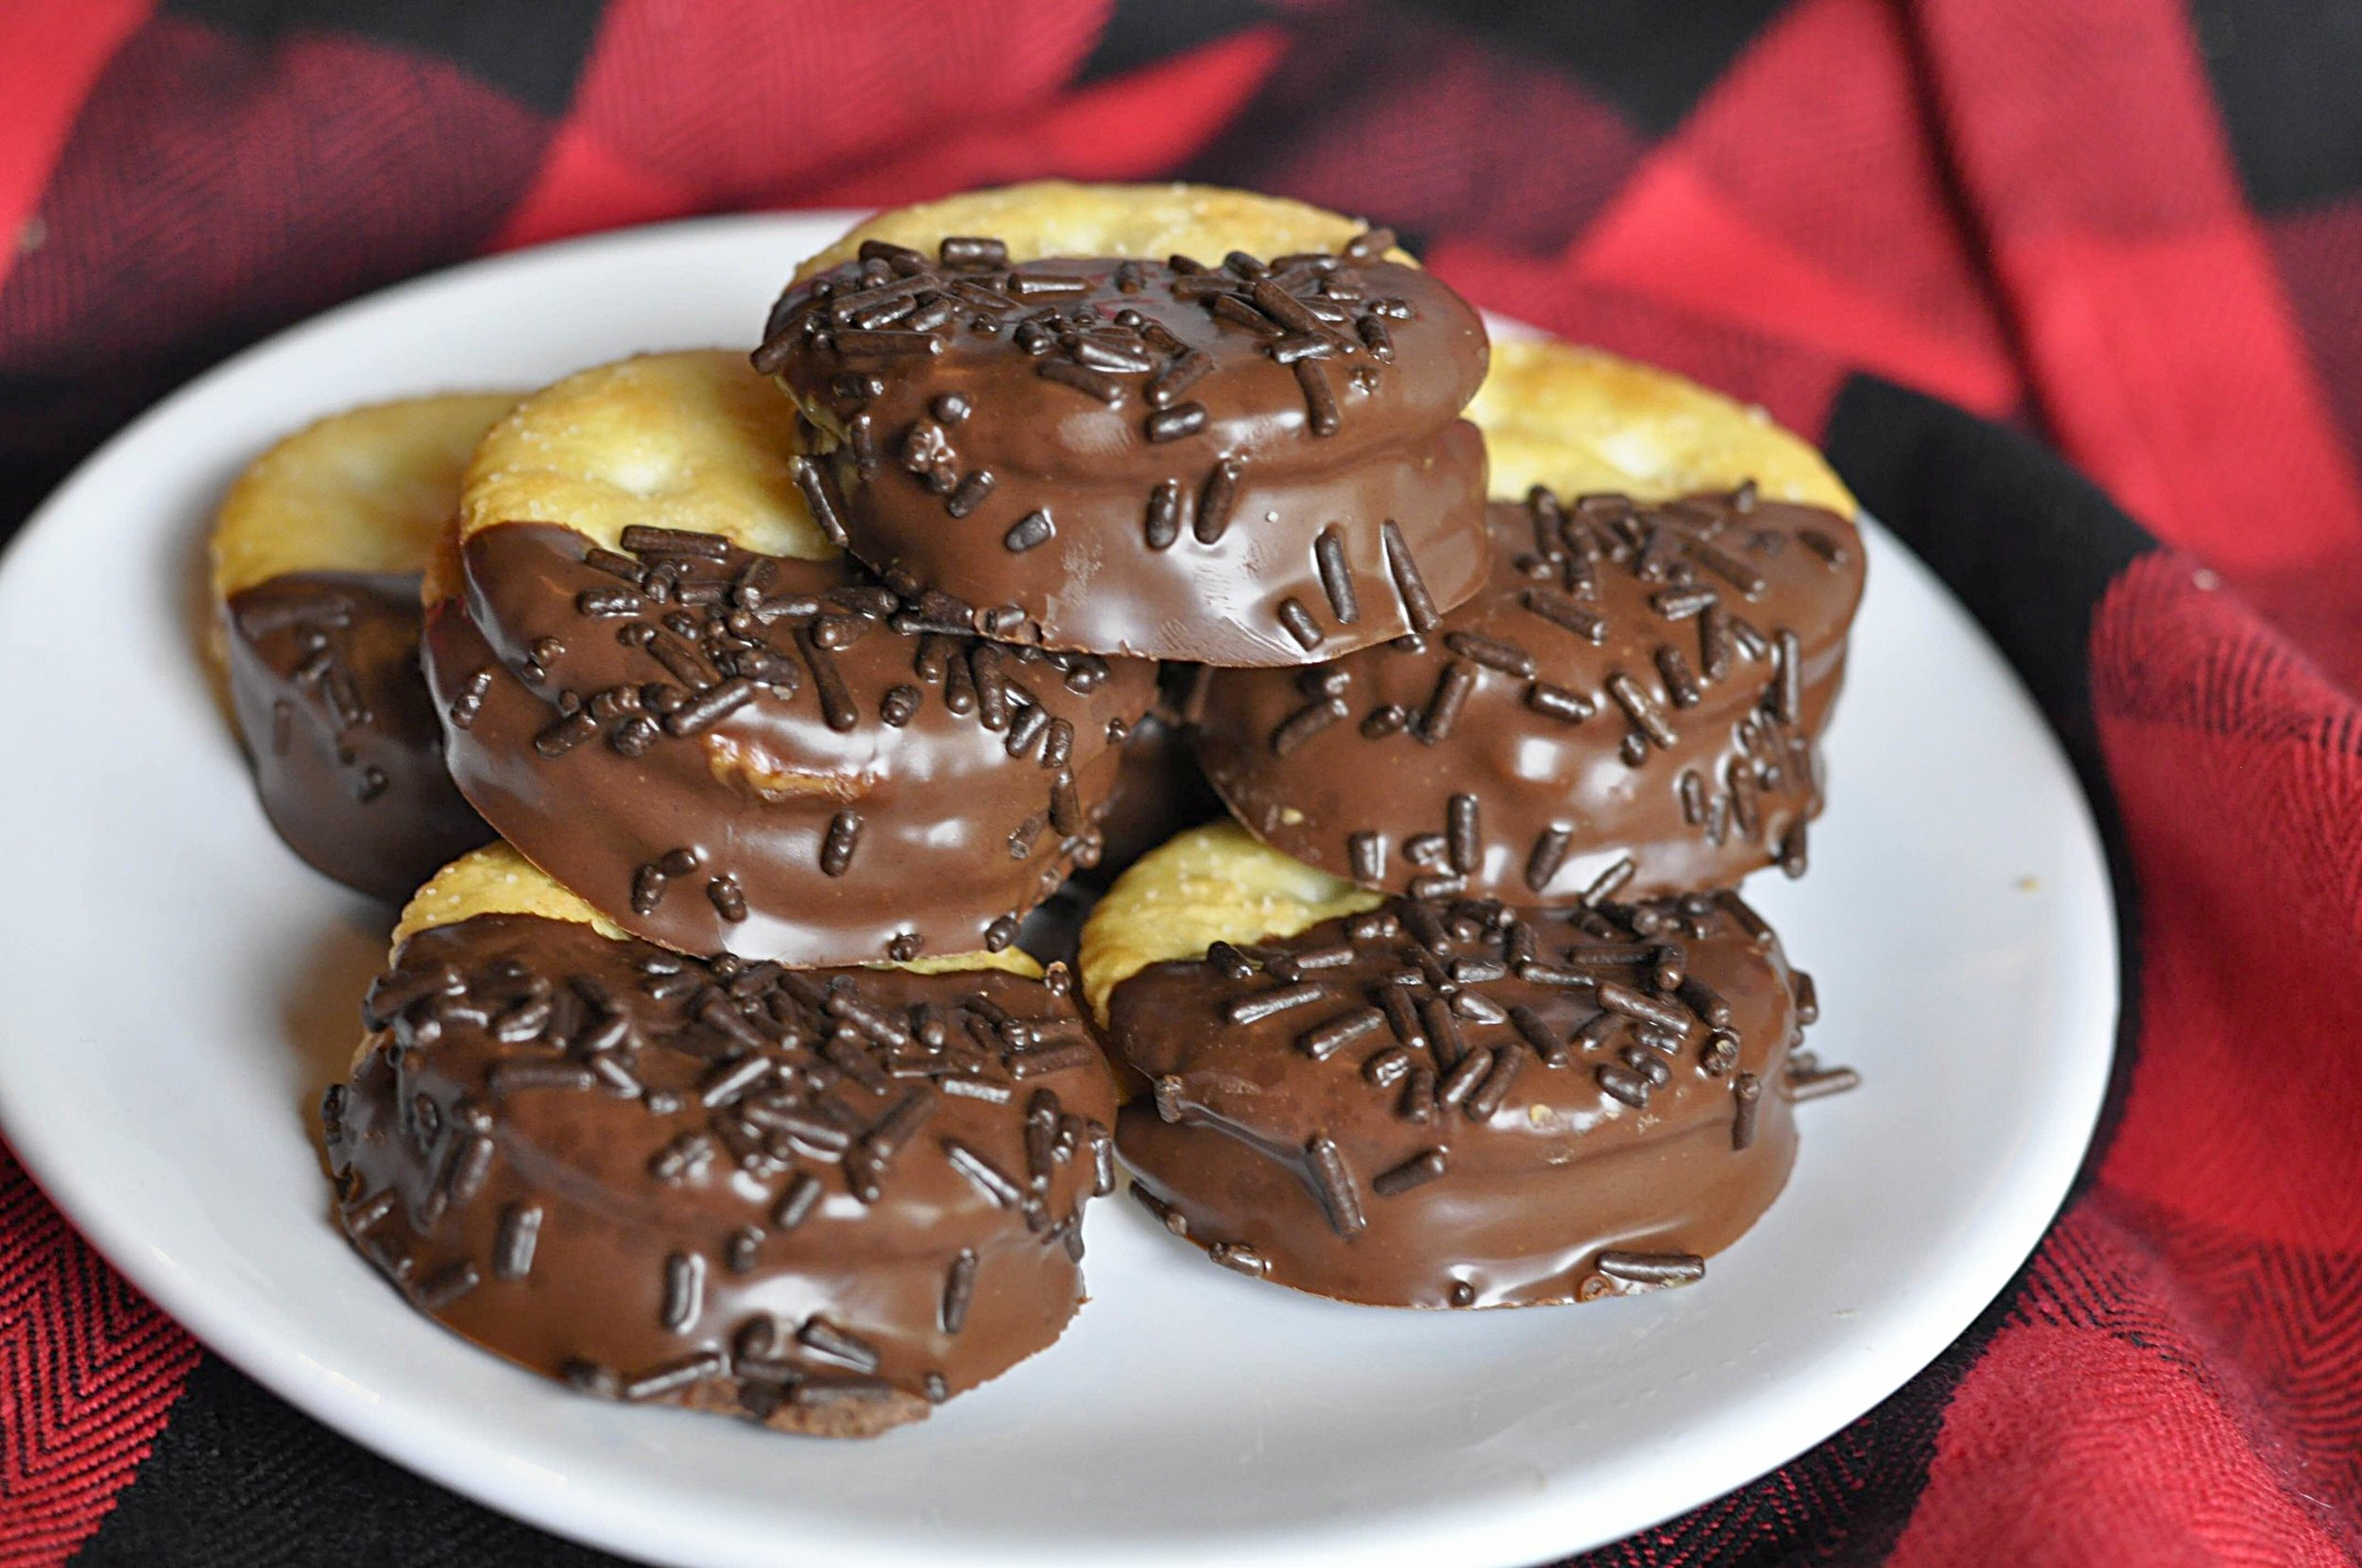 Chocolate Covered Peanut Butter Ritz Cookie Recipe | coupleinthekitchen.com